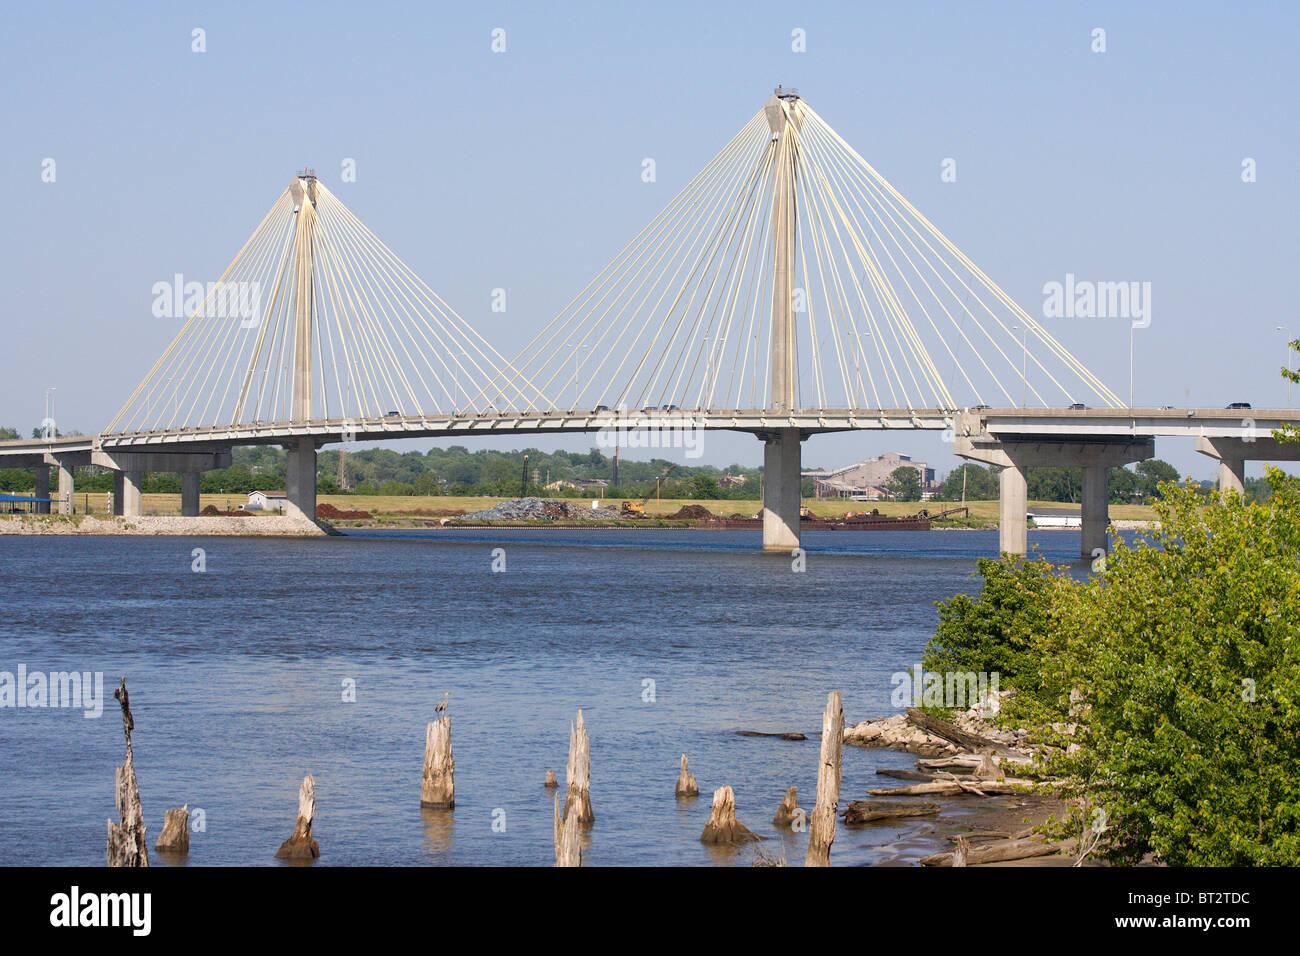 Clark Bridge, Alton, Illinois, United States - Stock Image